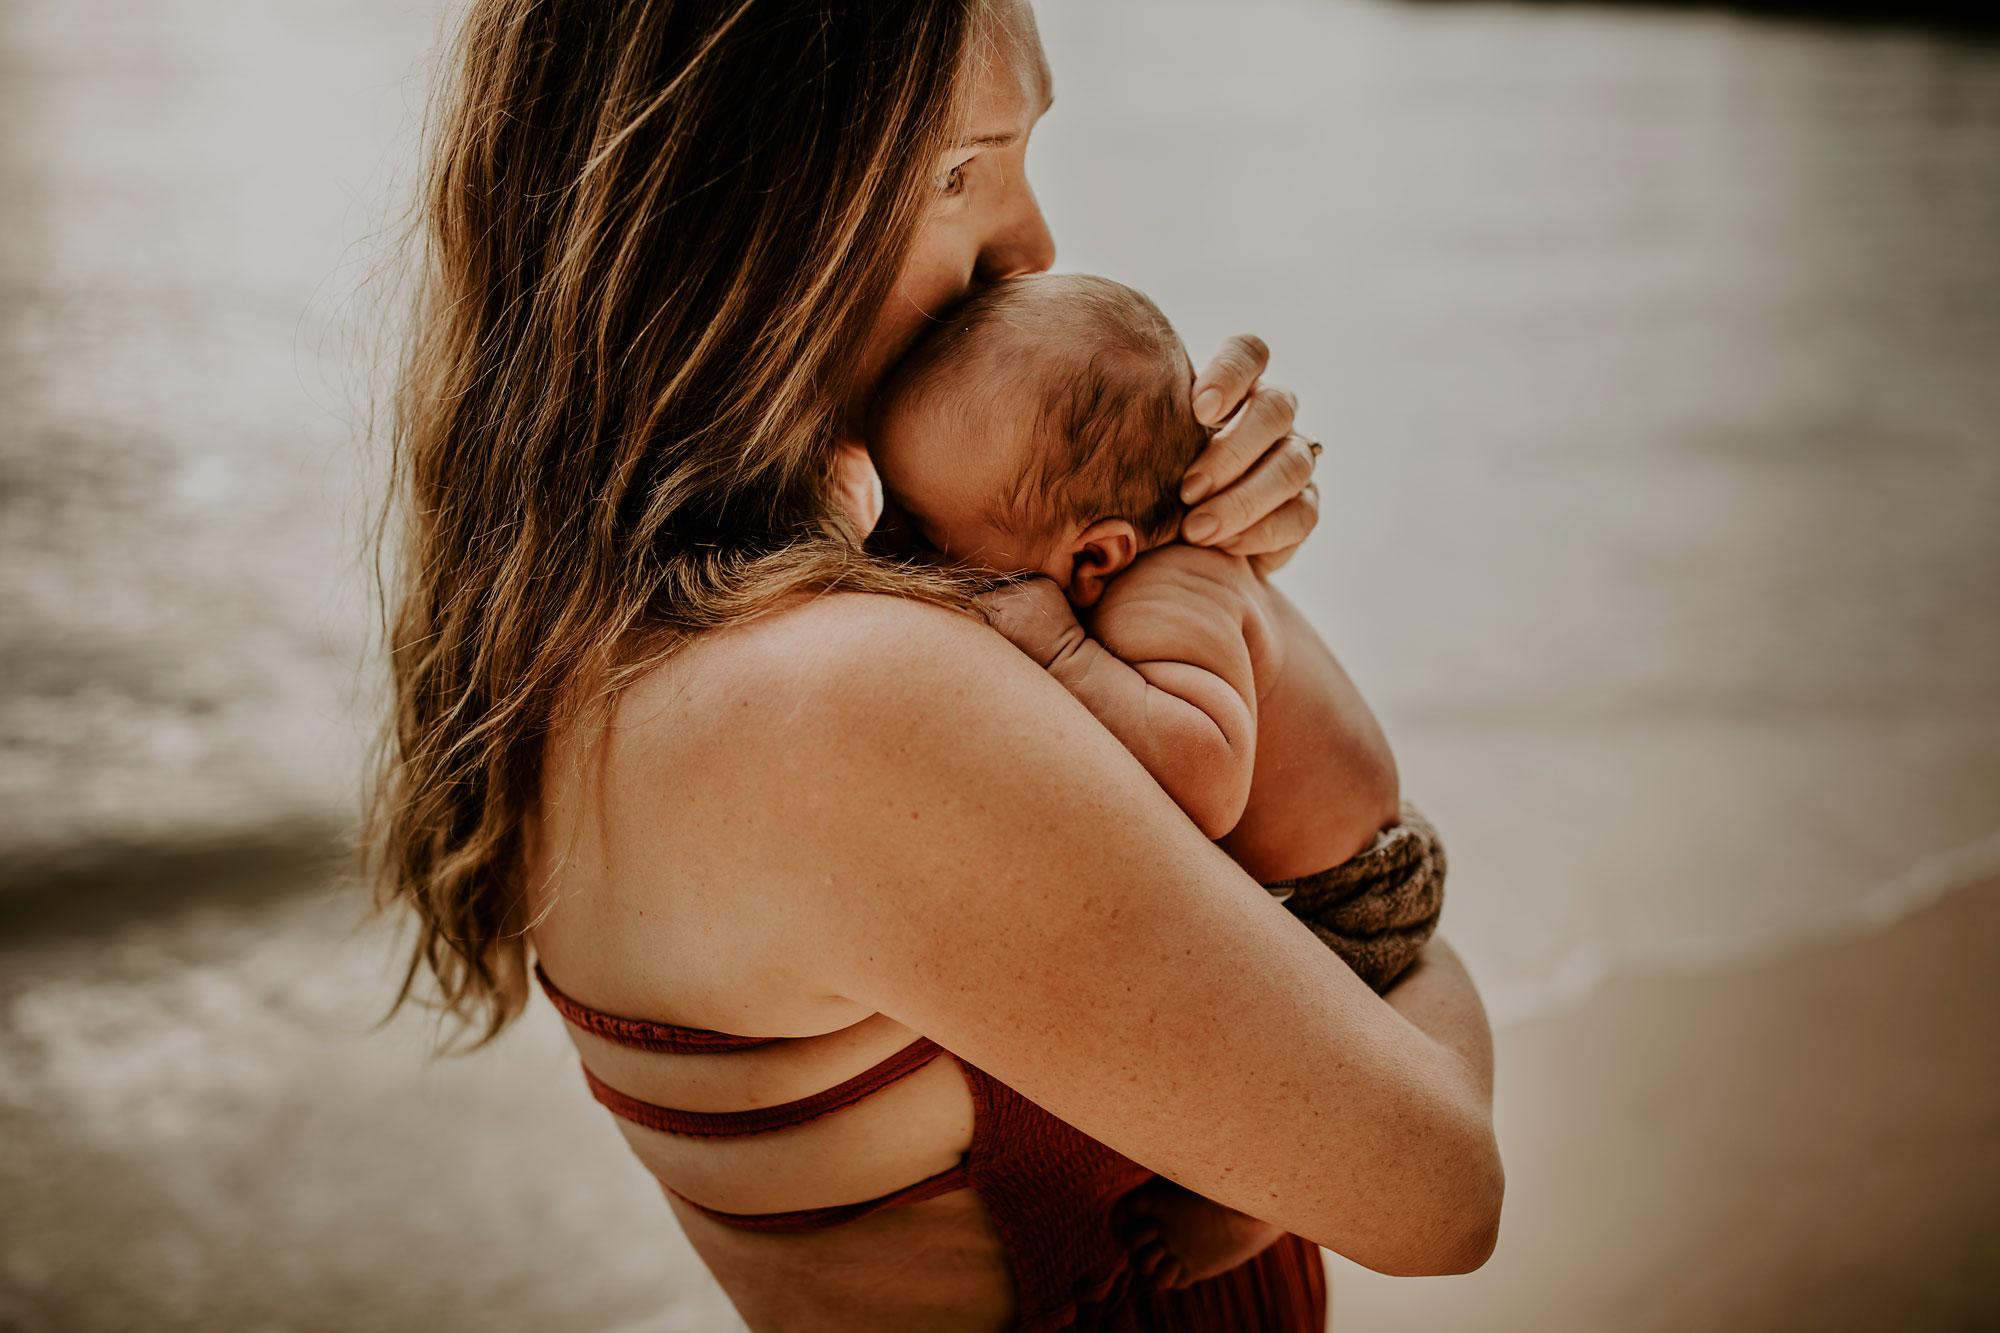 Hawaii-Outdoor-Newborn-Photography-13.jpg